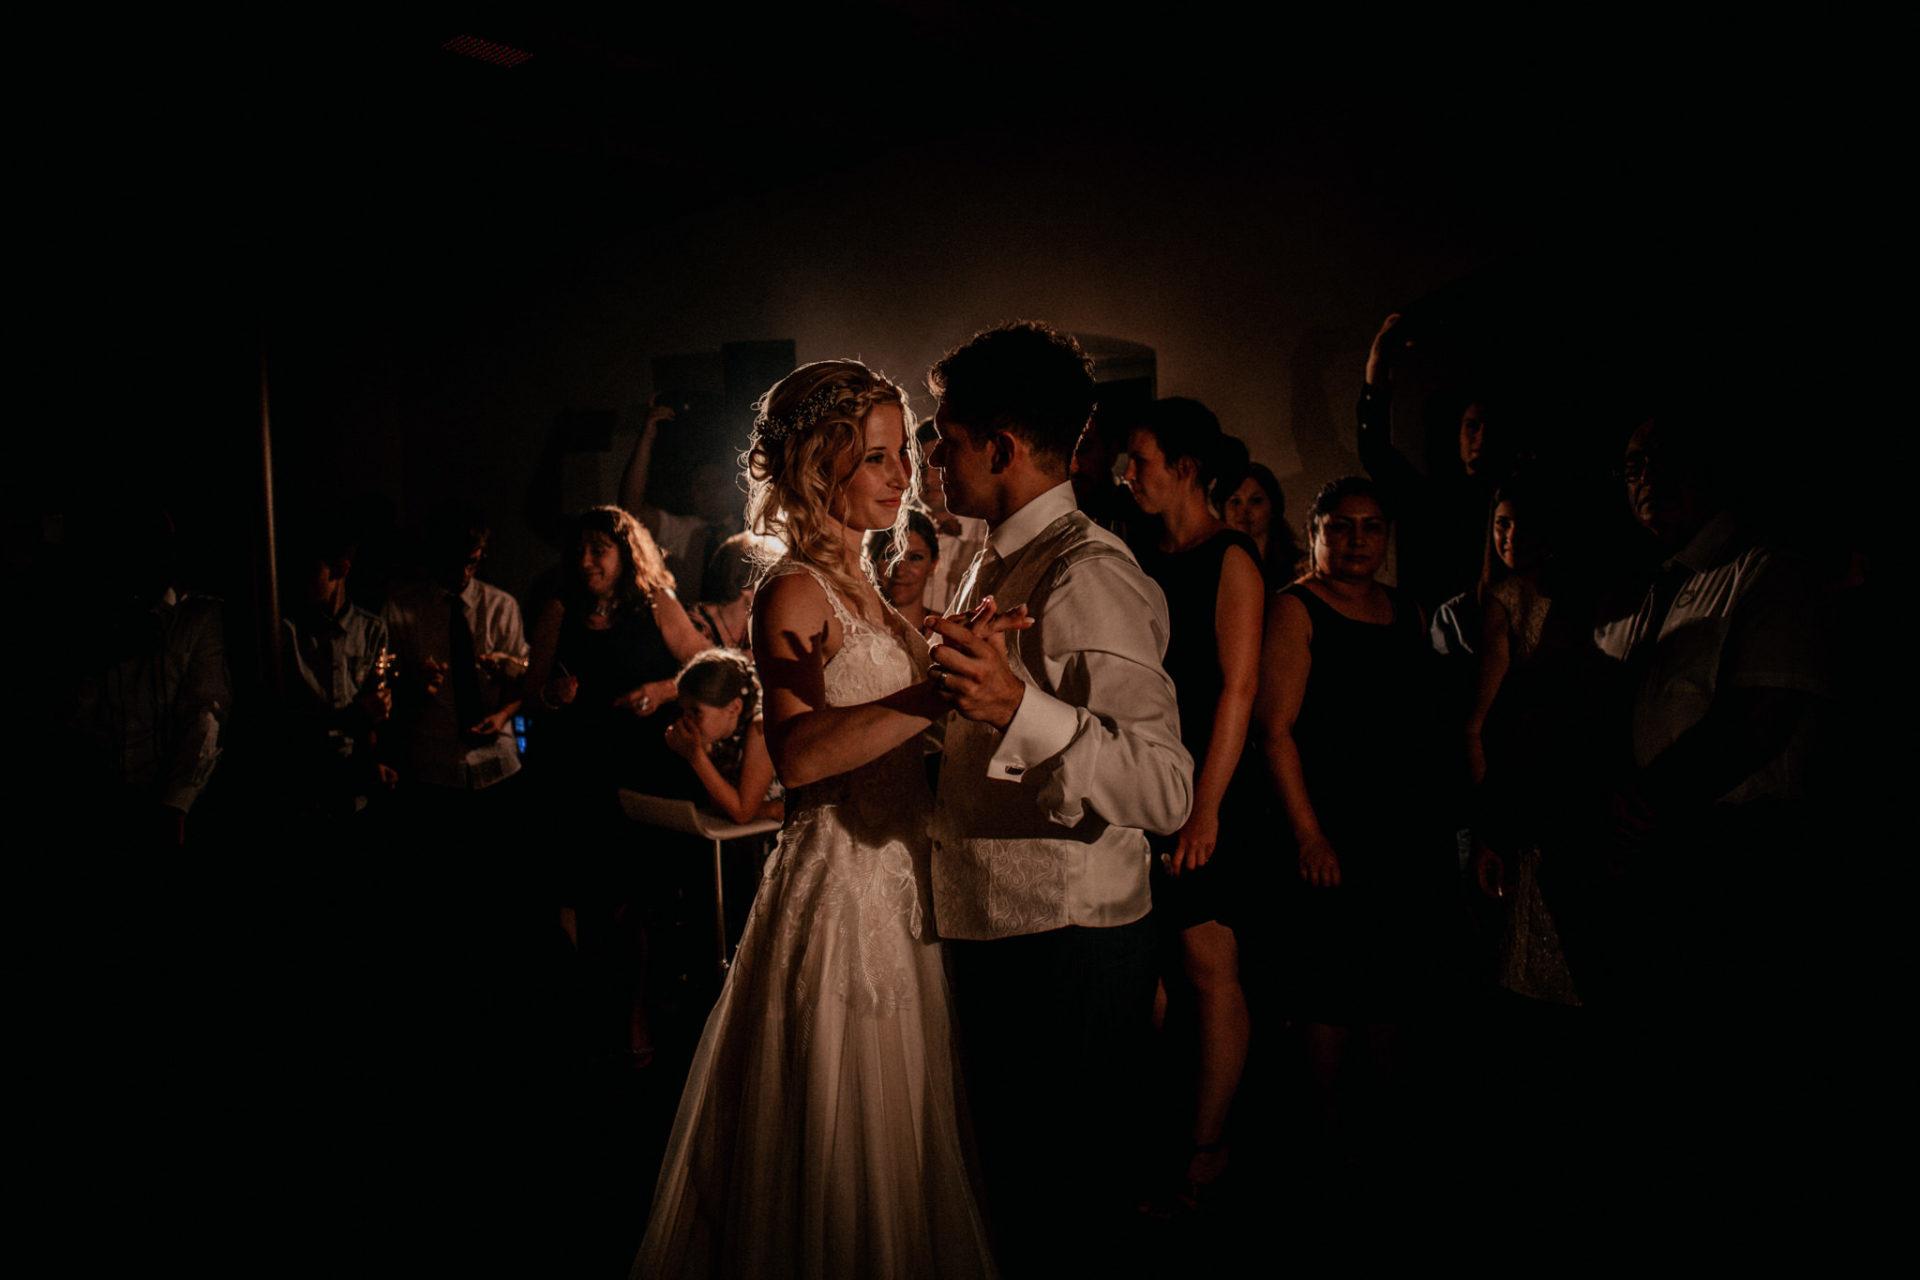 wedding photographer suttgart-reception water castle Erkenbrechtshausen Crailsheim-party-first dance